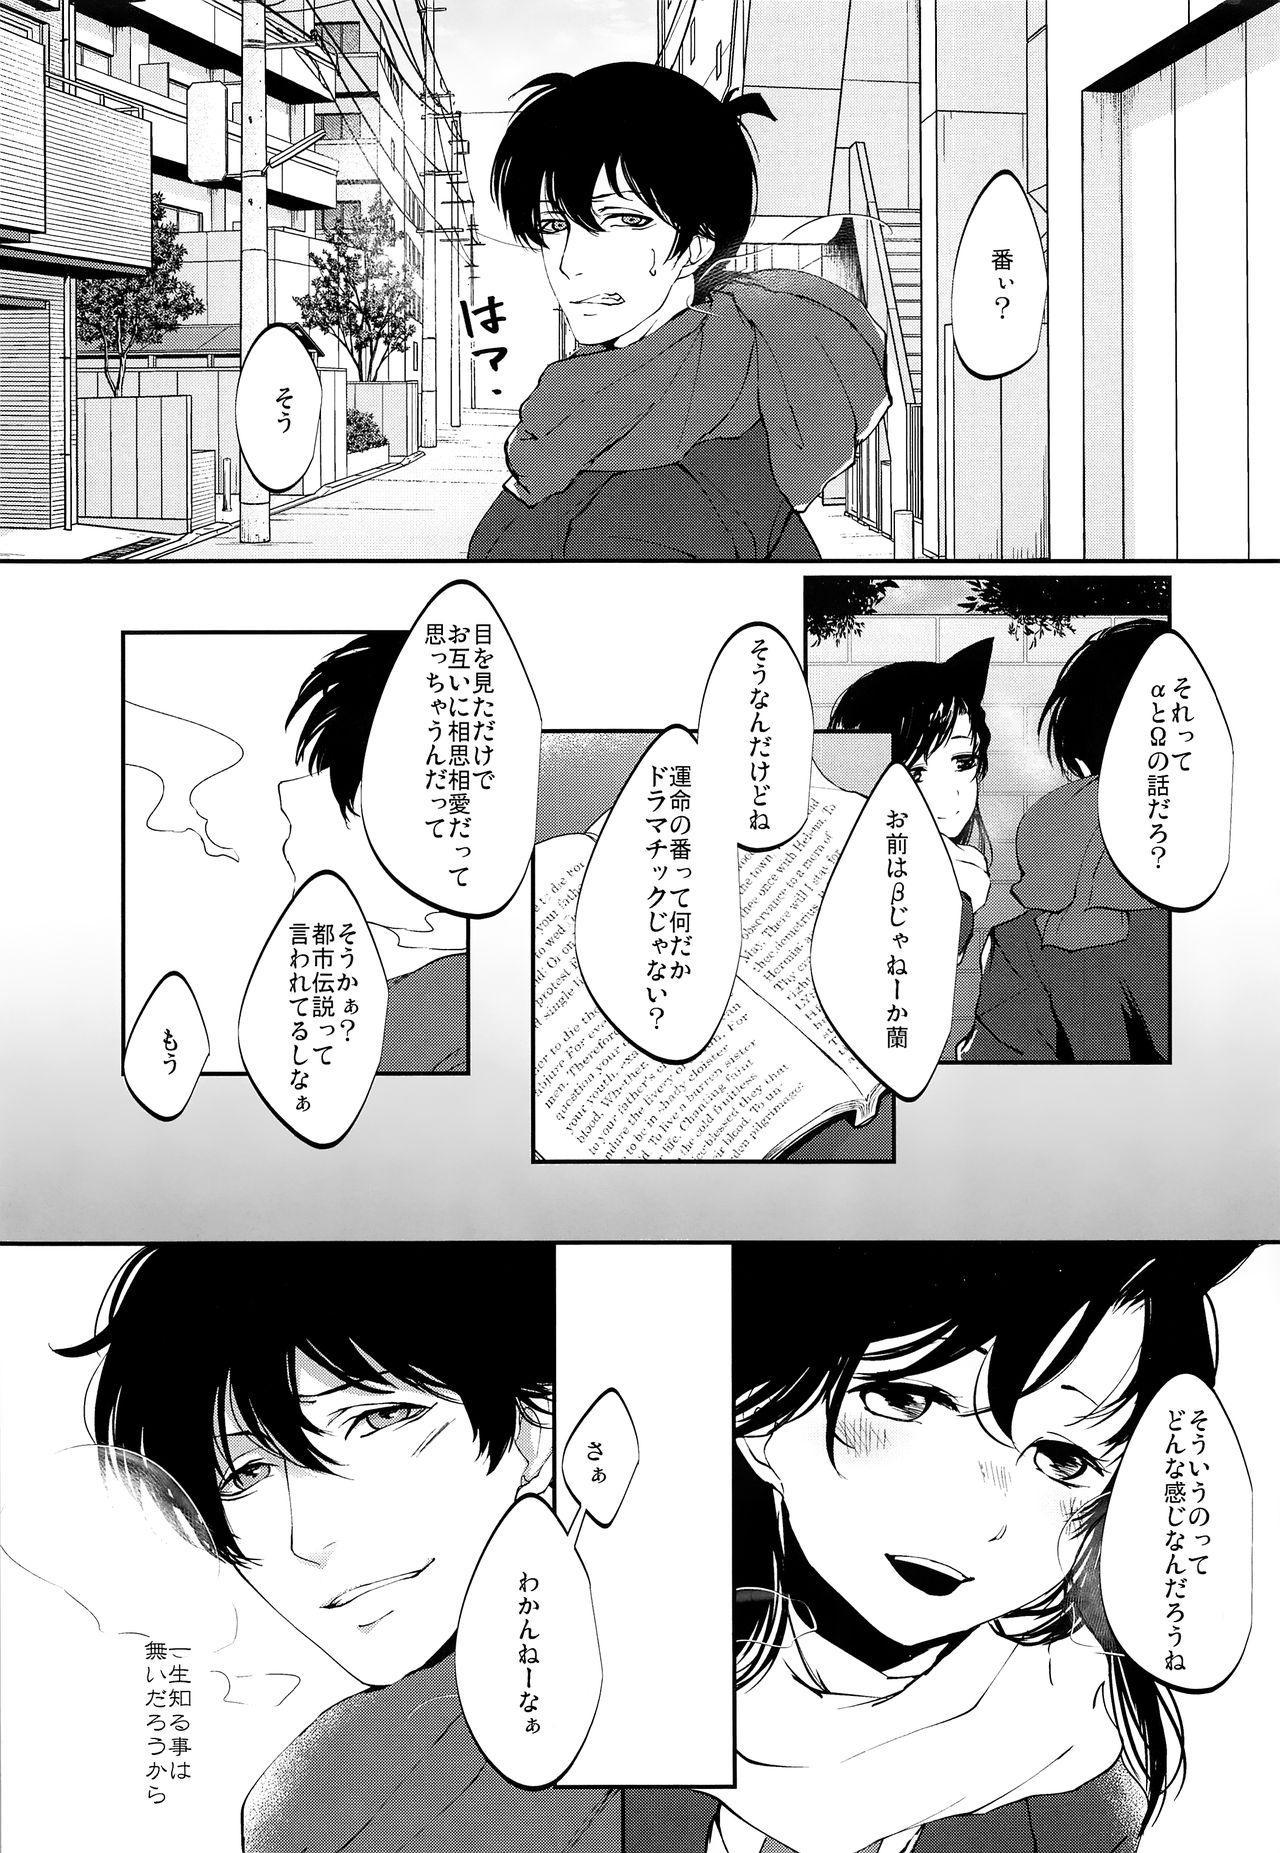 Kawaki 4